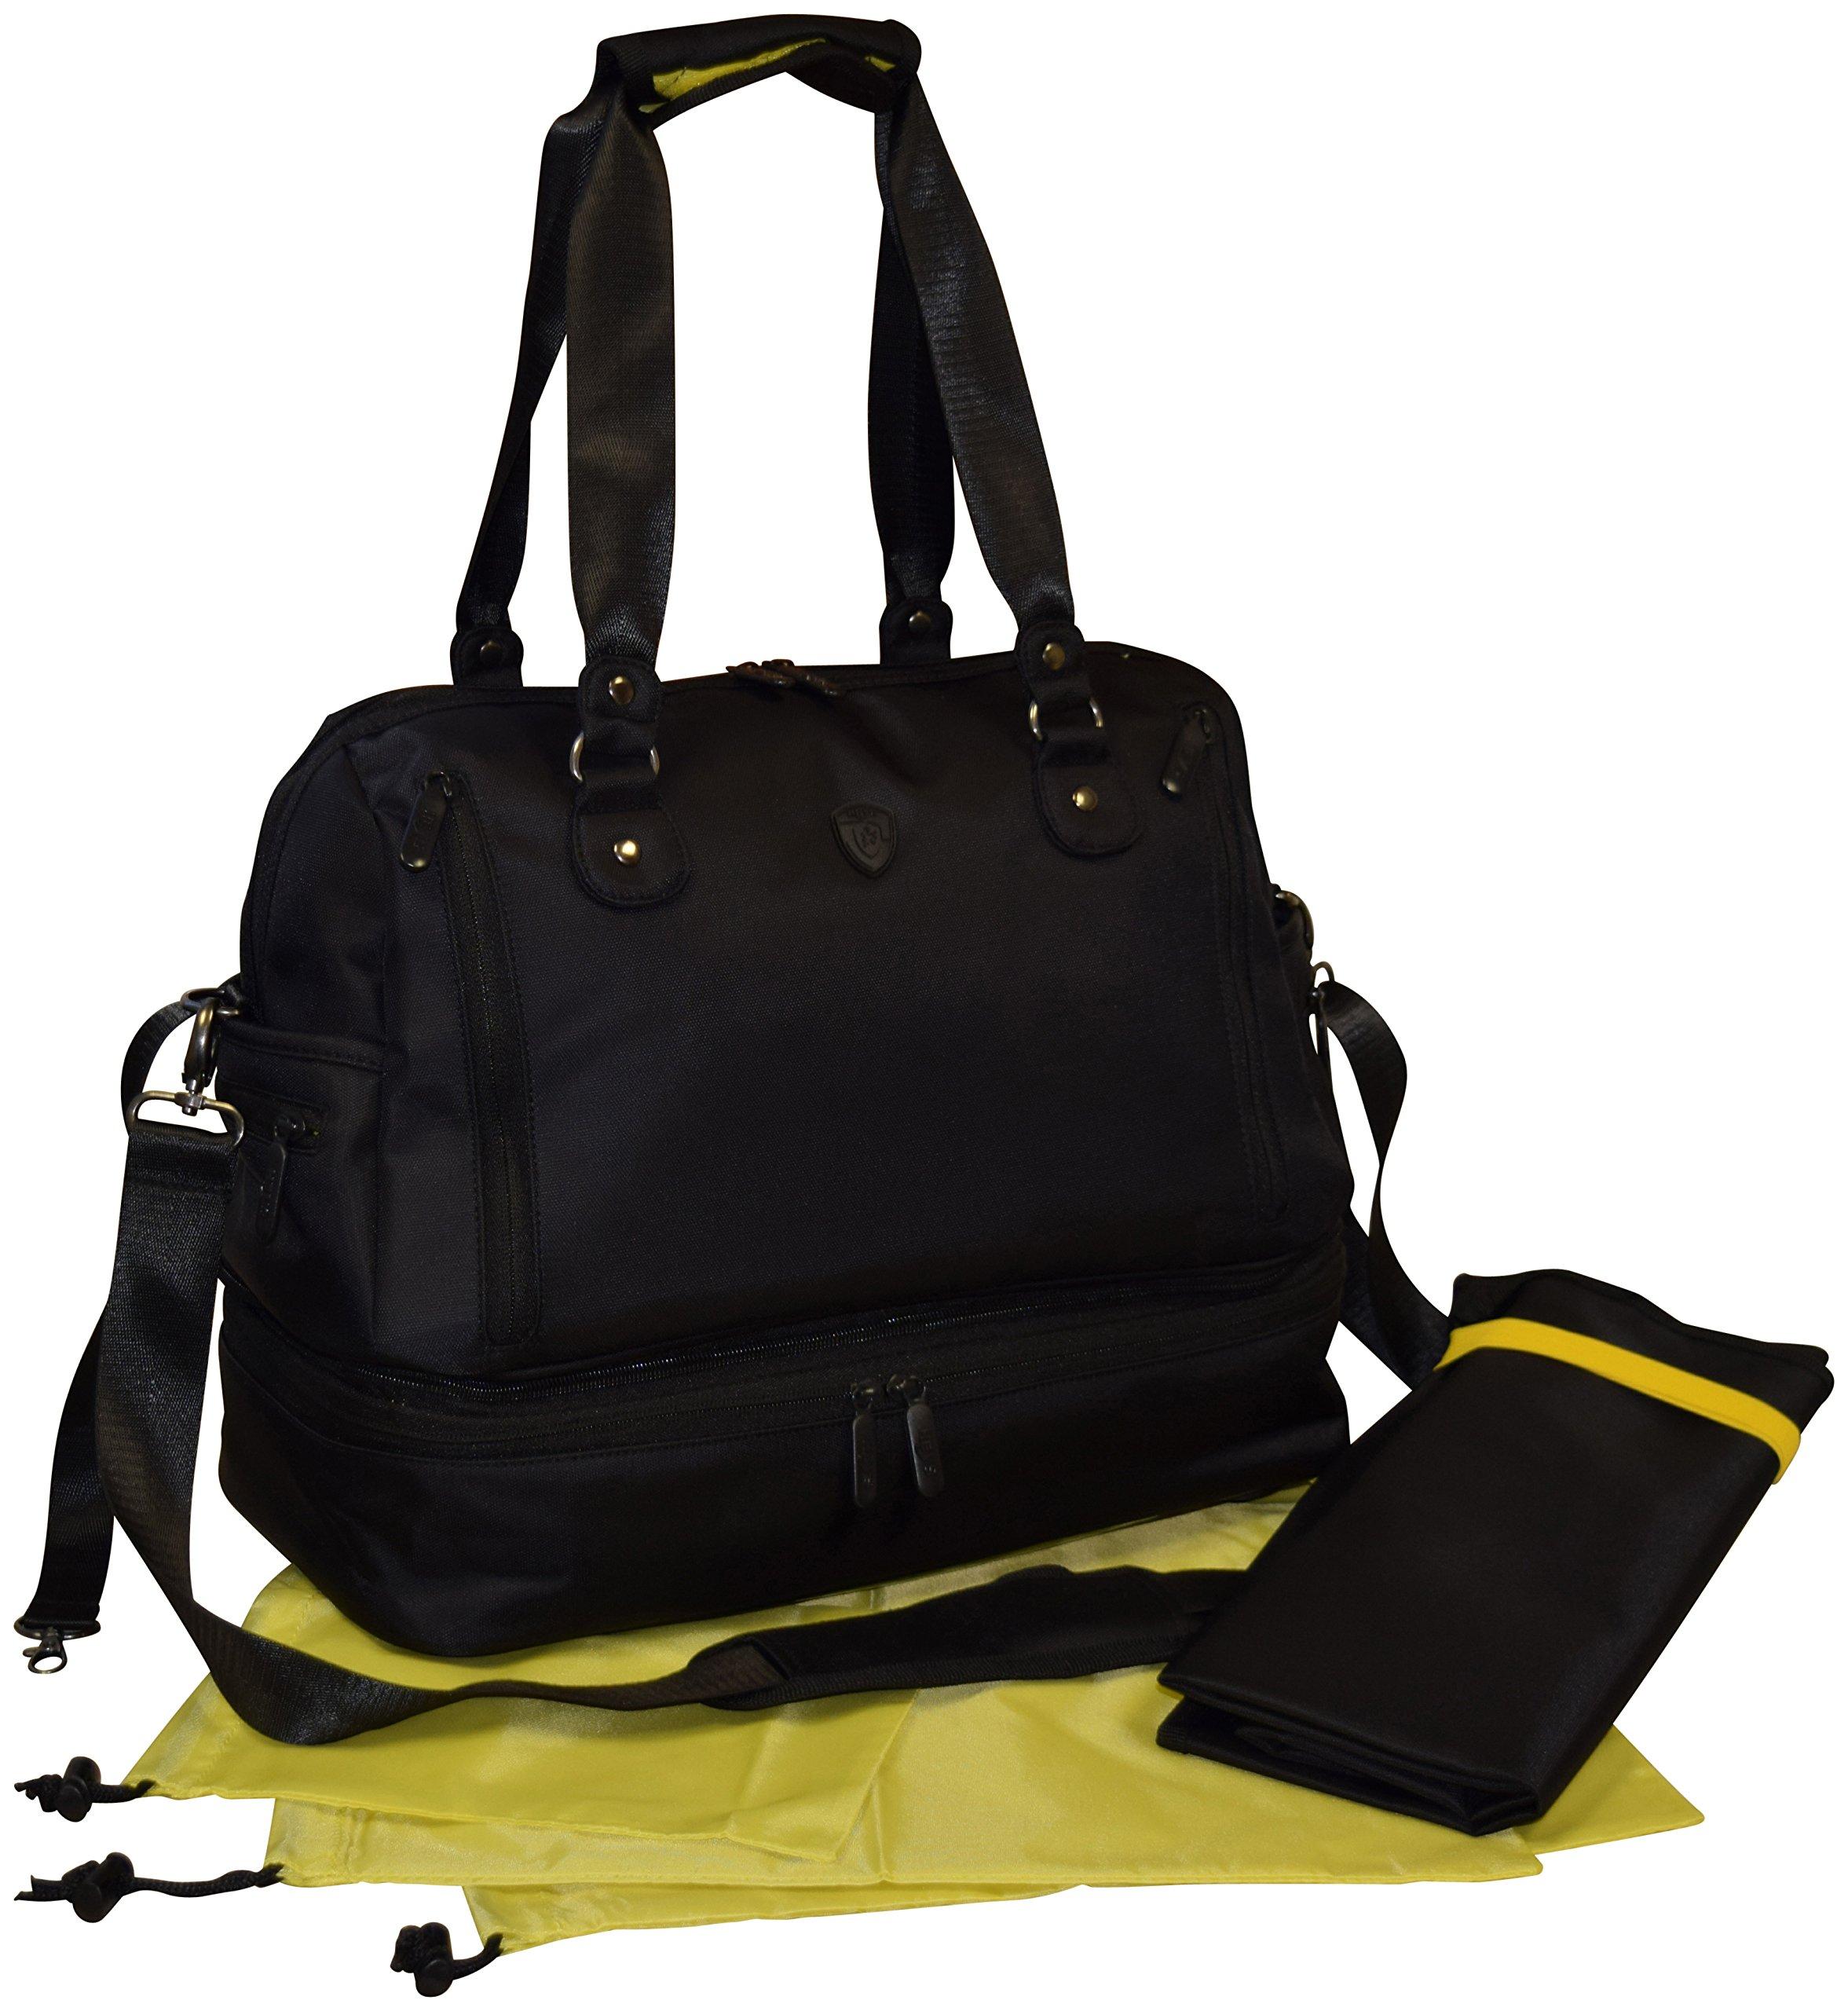 Heys Women Multi-Purpose 17'' Fitness Travel Duffel & Diaper Bag With Changing Pad (Black)